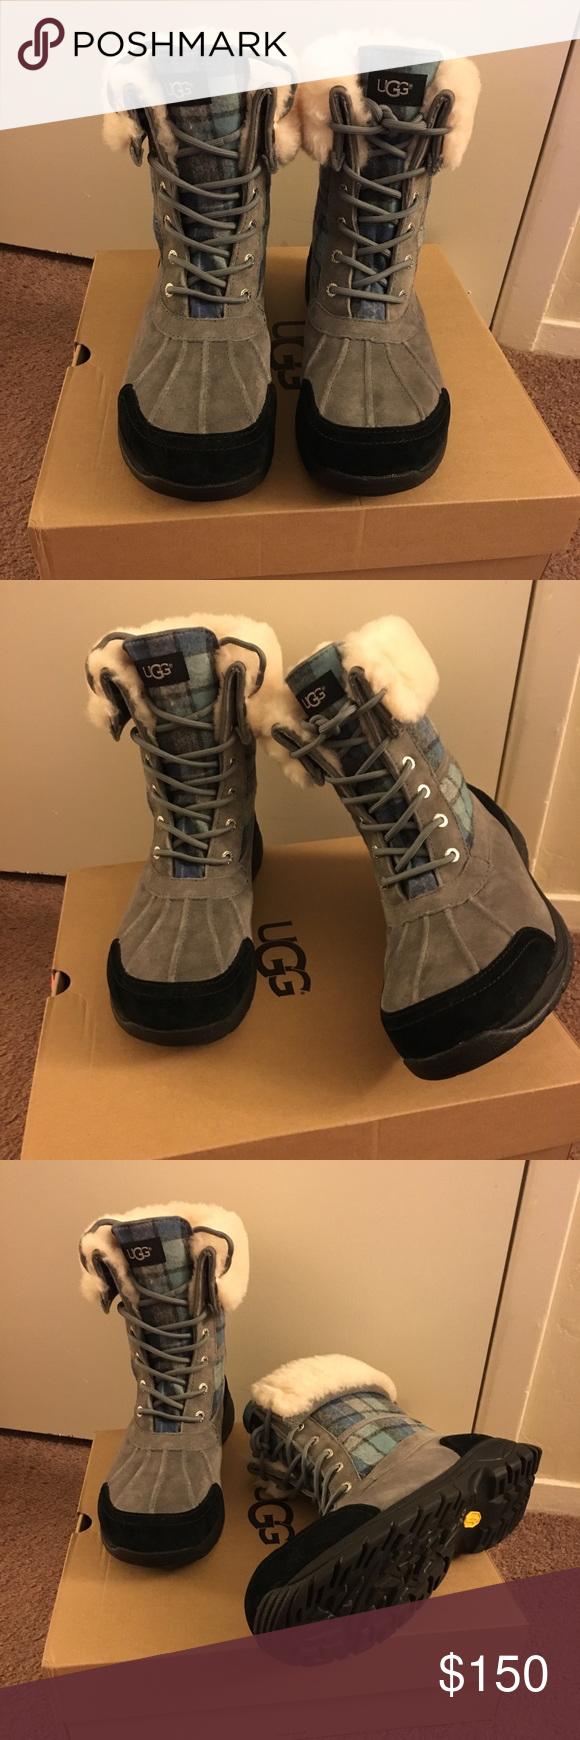 59888e003fc NIB UGG Men's Butte Surf Plaid Winter Boots 100% Authentic Brand New ...